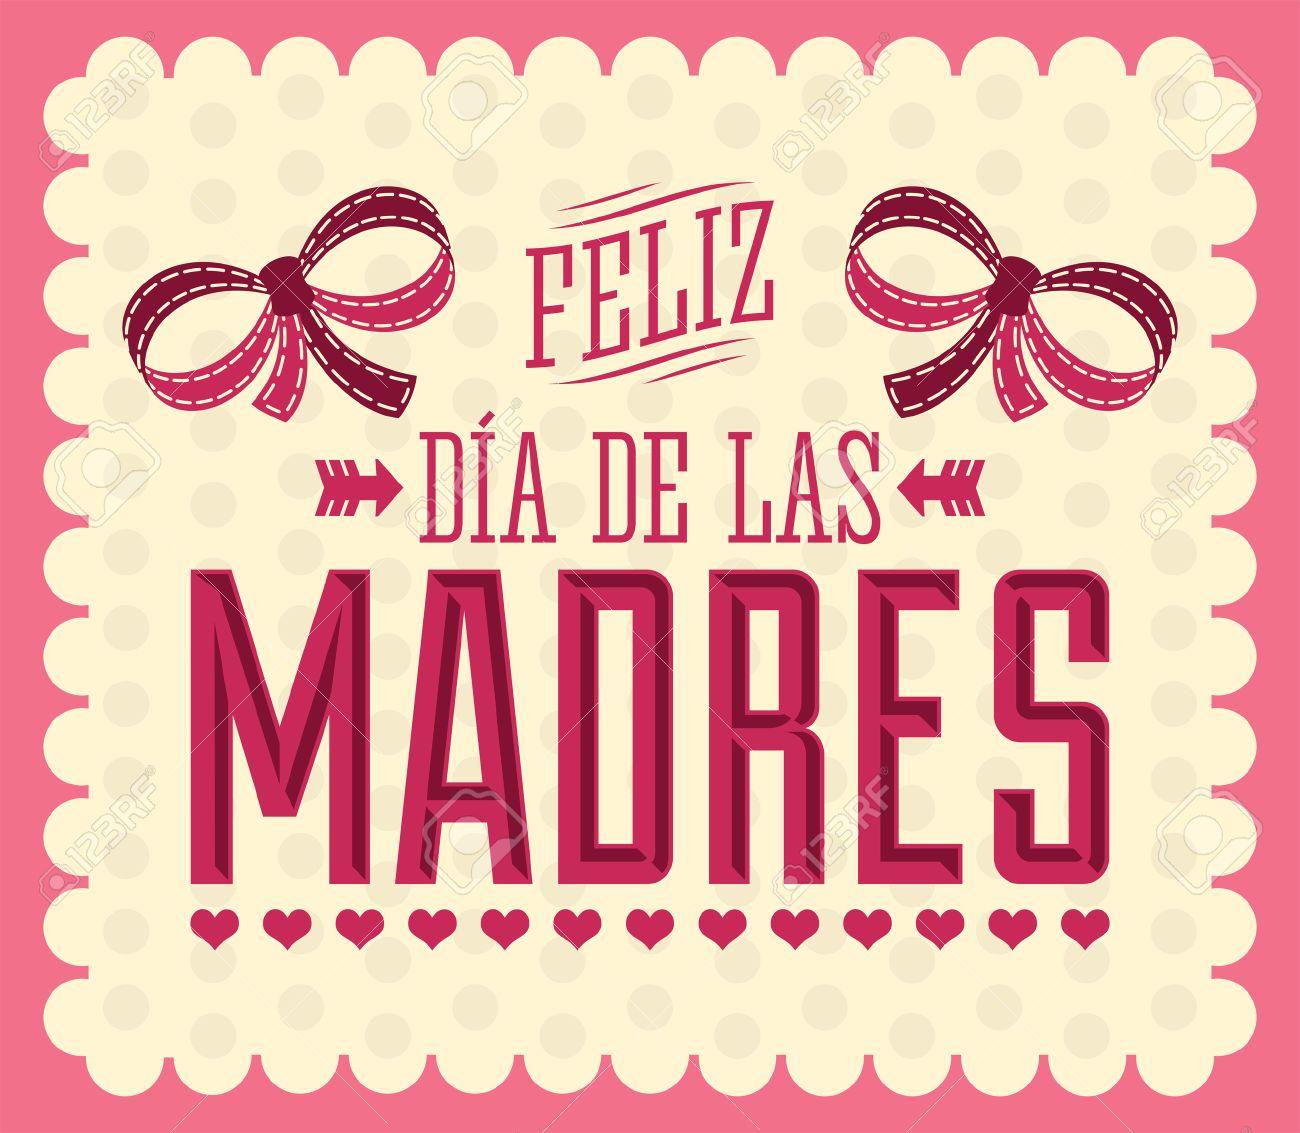 Feliz Dia Delas Madres Wallpaper Retro Buscar Con Google Feliz Dia De La Madre Imagenes De Feliz Dia Tarjeta Feliz Dia